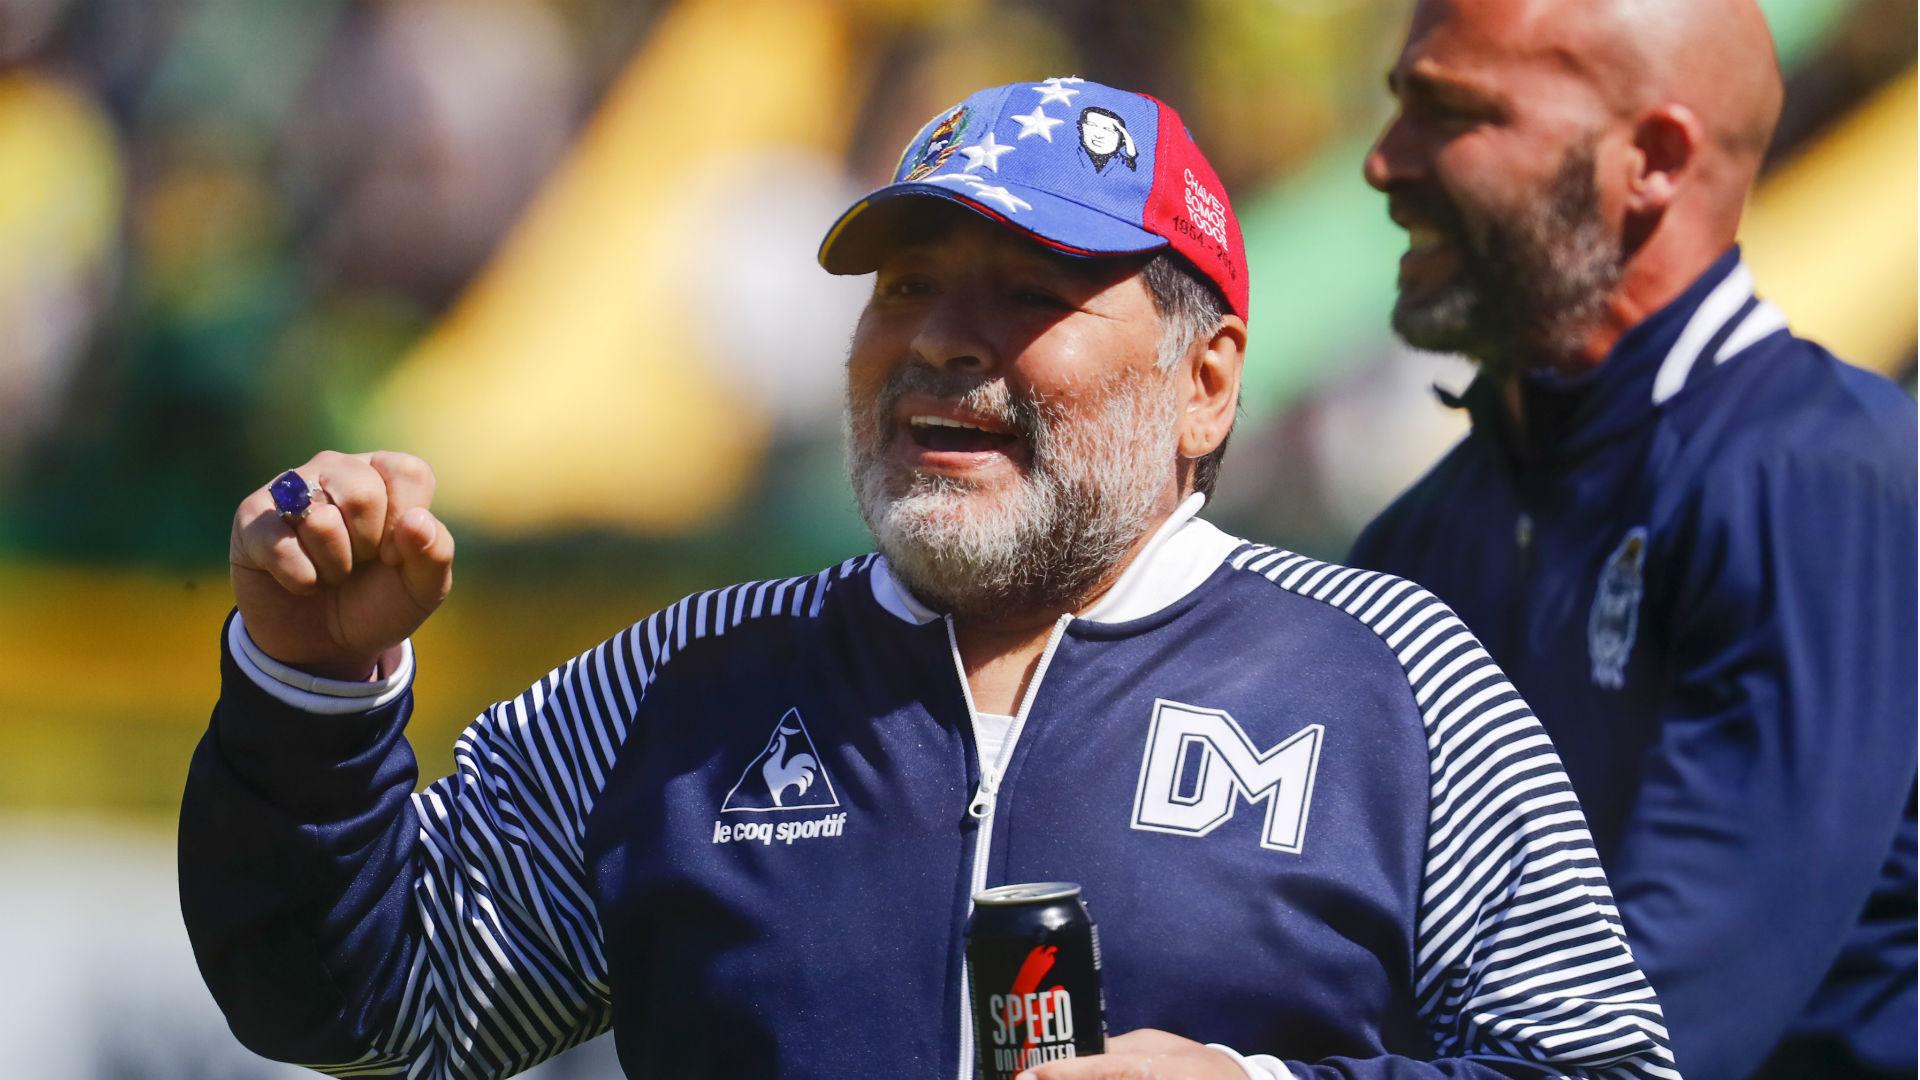 Diego Maradona dies: Guardiola pays tribute to 'man of joy' as Klopp hails Argentina great